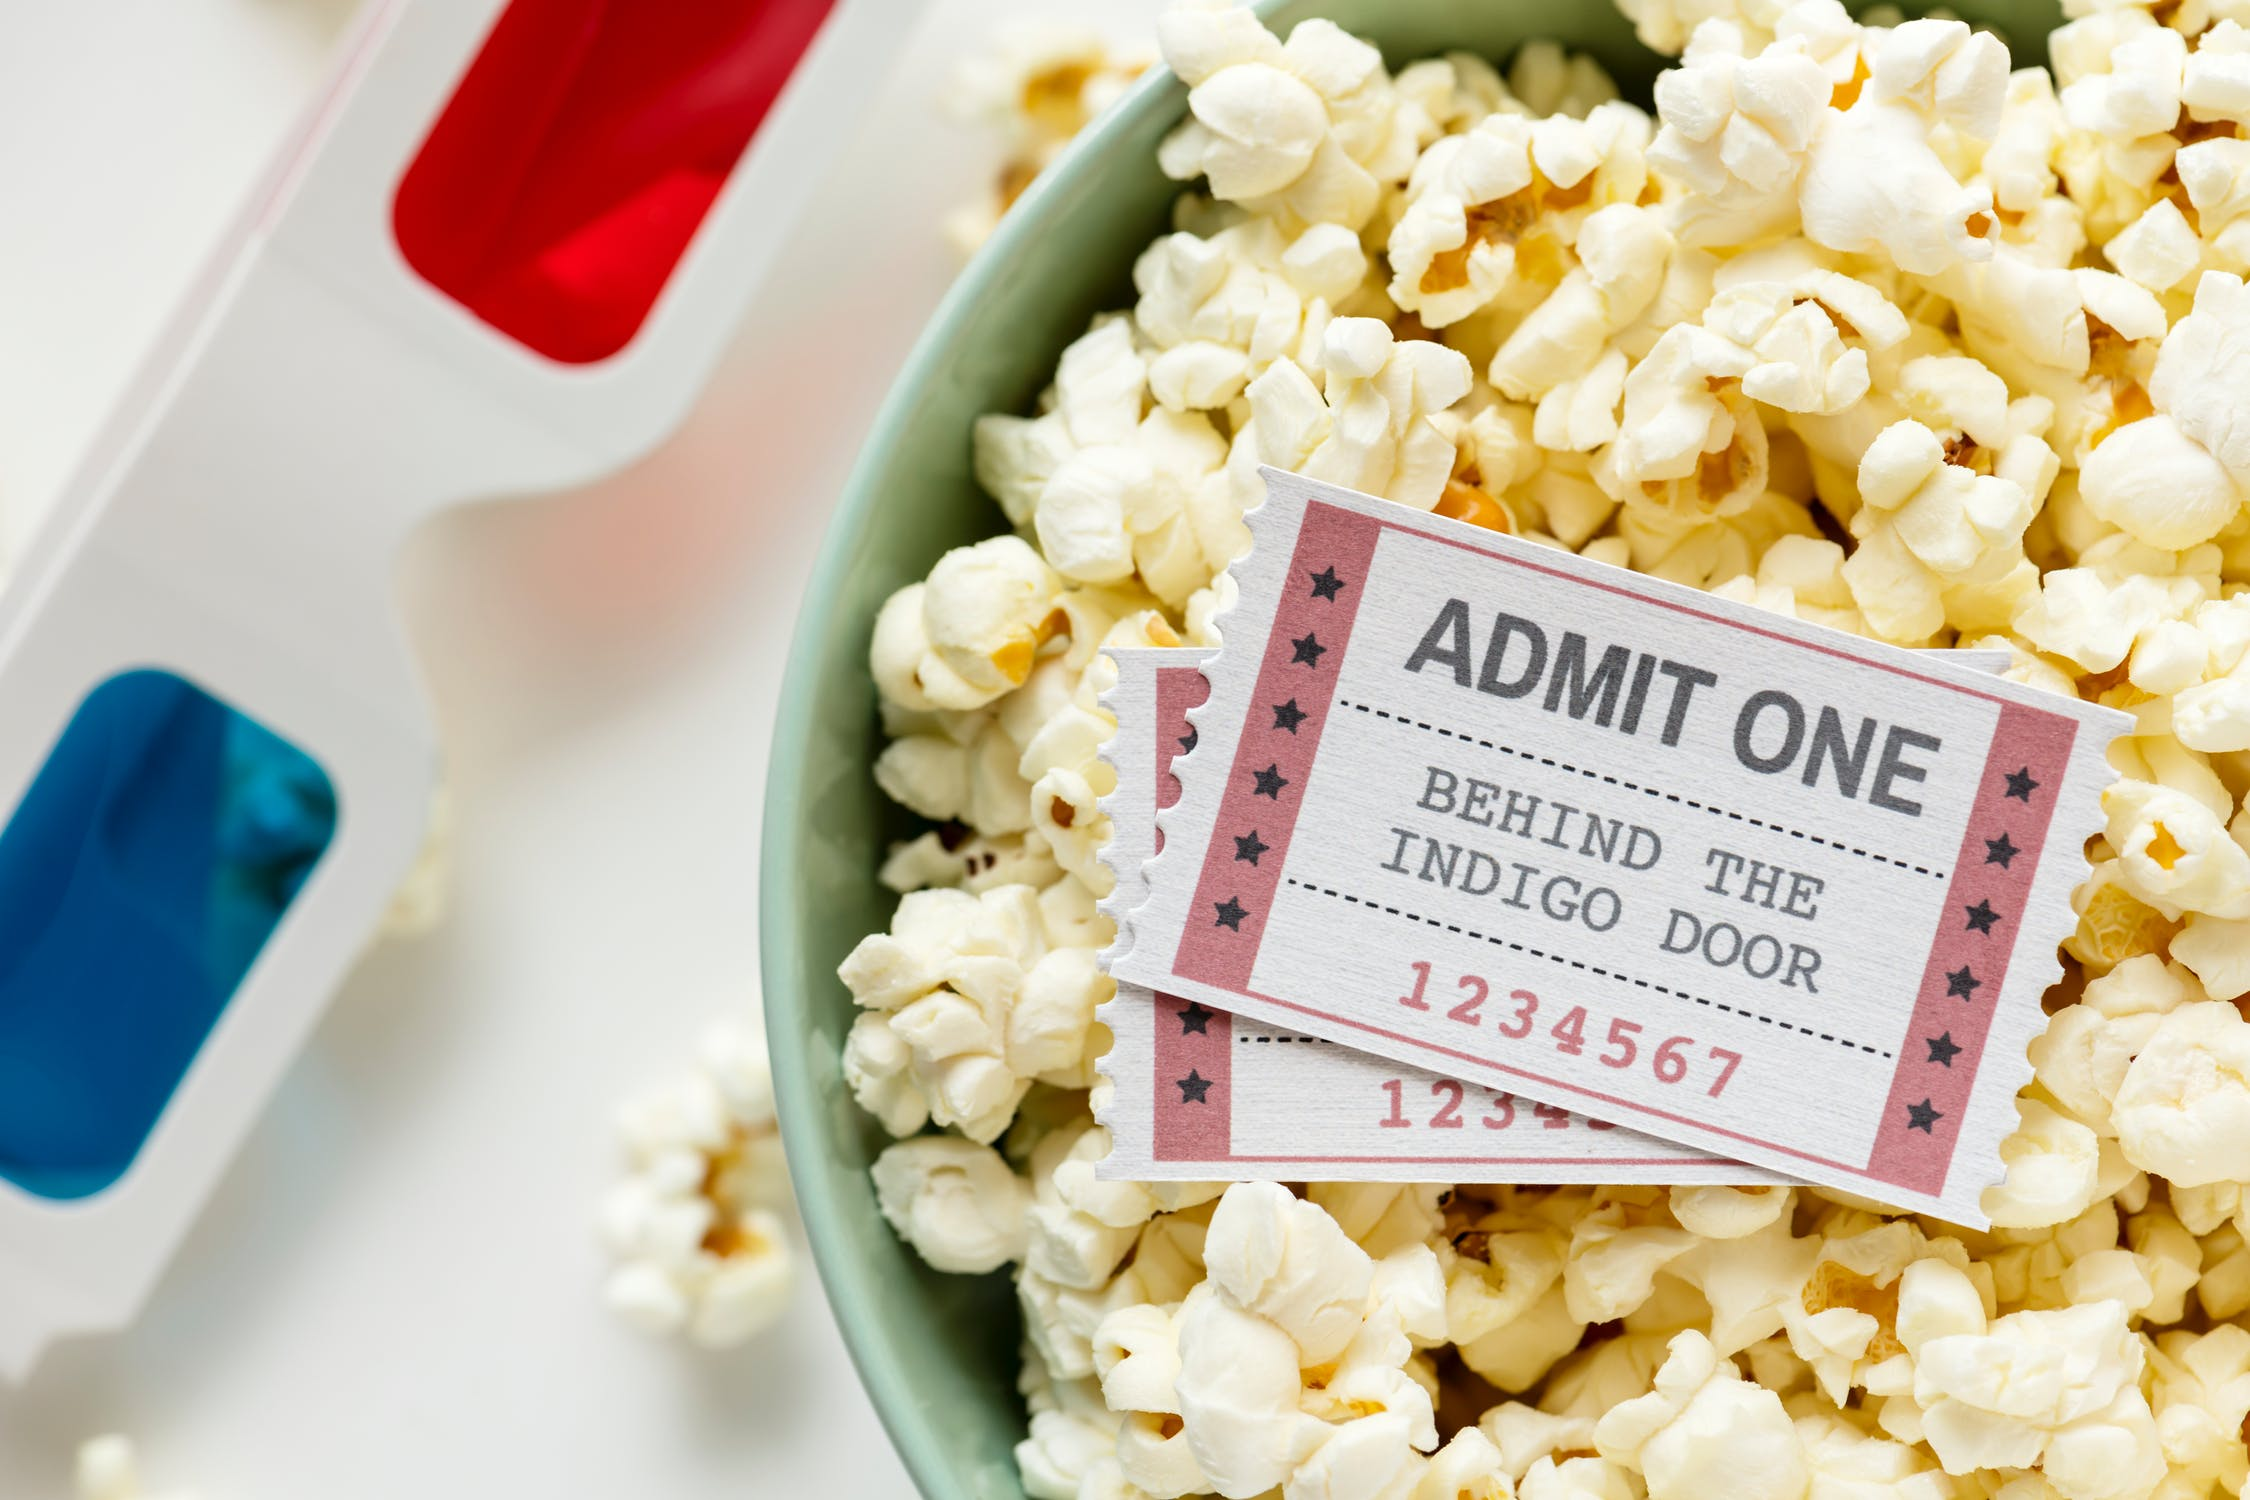 Ce filme vedem in decembrie la cinema?